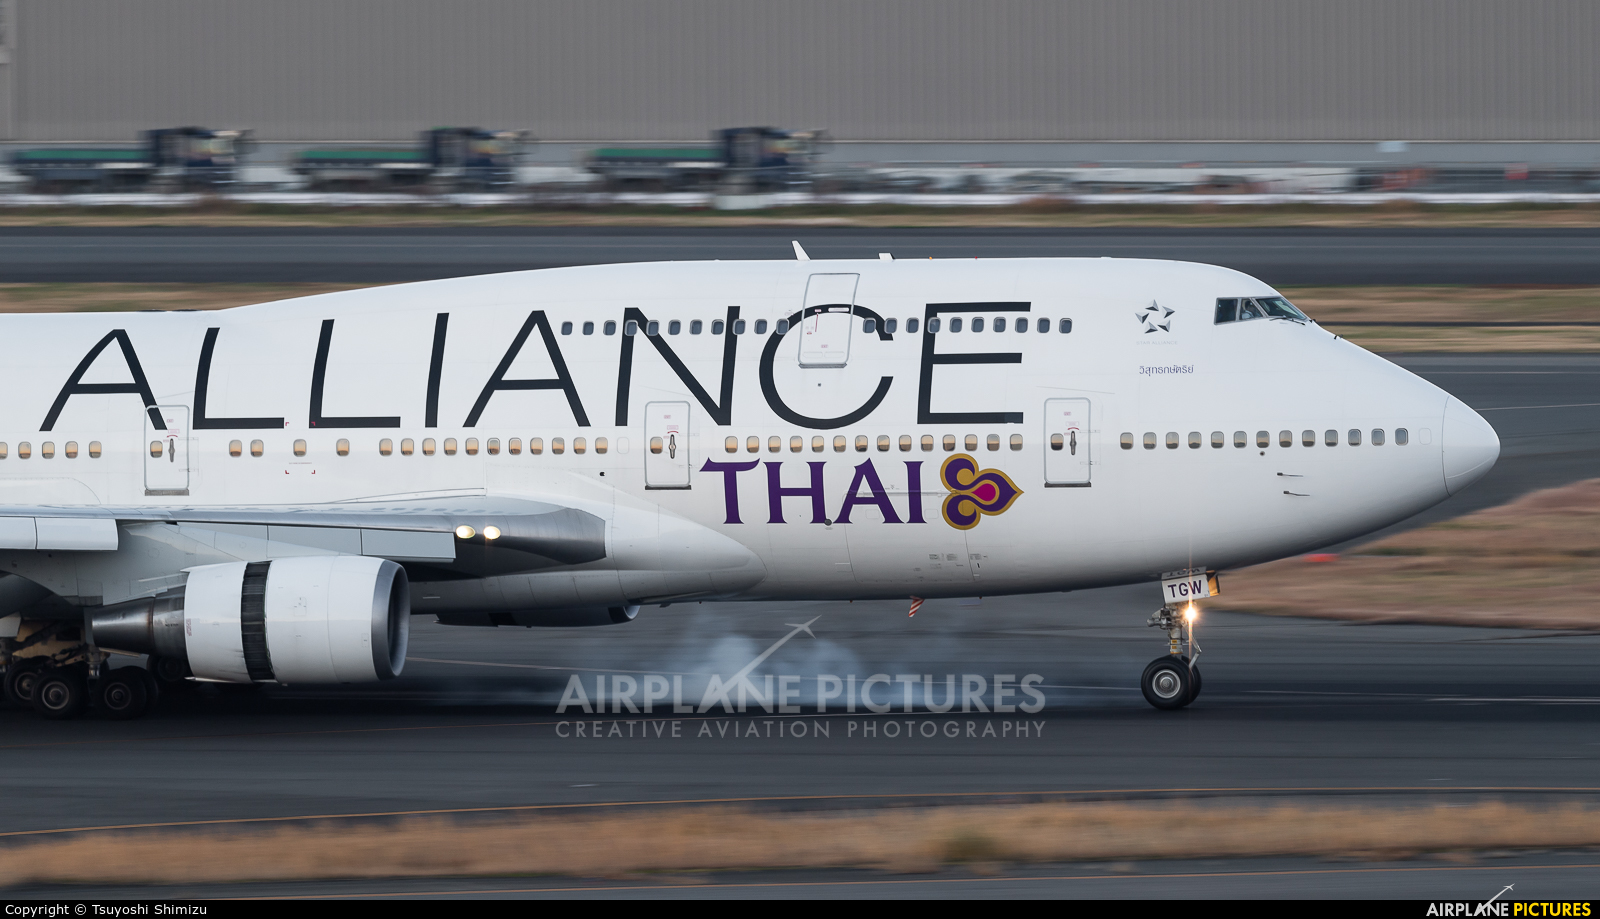 Thai Airways HS-TGW aircraft at Tokyo - Haneda Intl